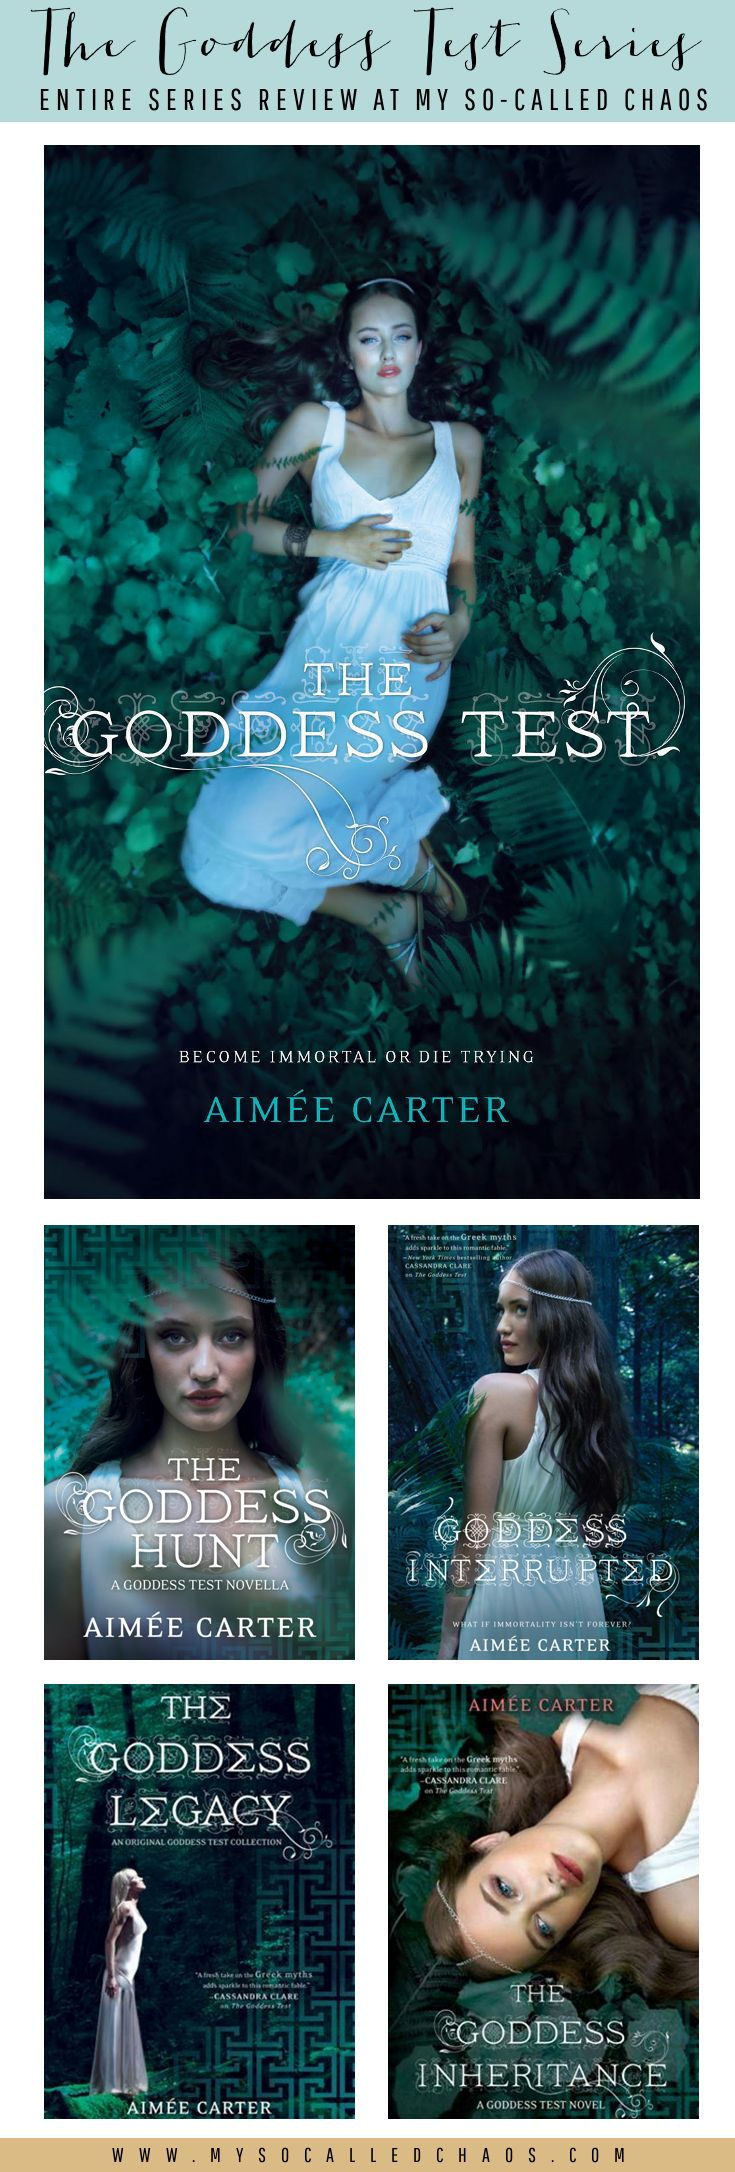 Book Review   The Goddess Test Series by Aimée Carter http://mysocalledchaos.com/2015/01/book-review-goddess-test-series-by.html